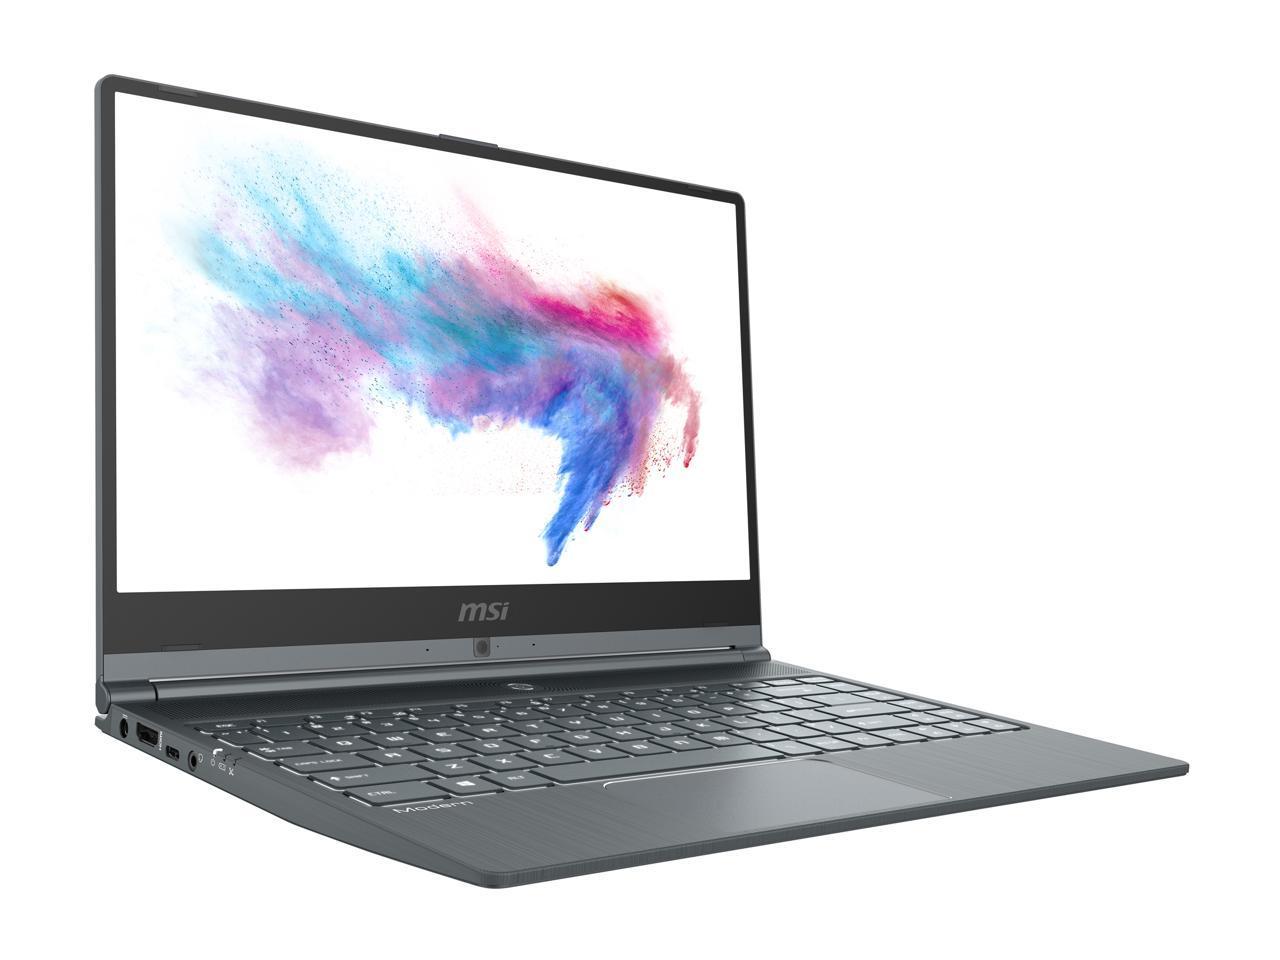 MSI Laptop Modern 14 A10RAS-1031 Intel Core i5 10th Gen 10210U (1.60 GHz) 8 GB Memory 512 GB NVMe SSD for $549 AR+FS@NEWEGG